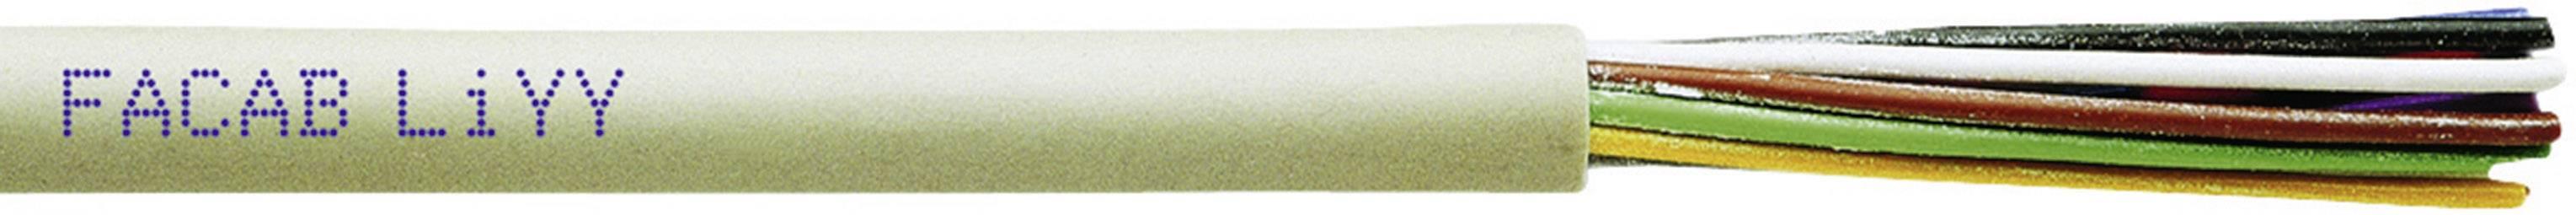 Riadiaci kábel Faber Kabel LiYY 030395, 4 x 0.14 mm², vonkajší Ø 3.70 mm, 250 V, metrový tovar, sivá